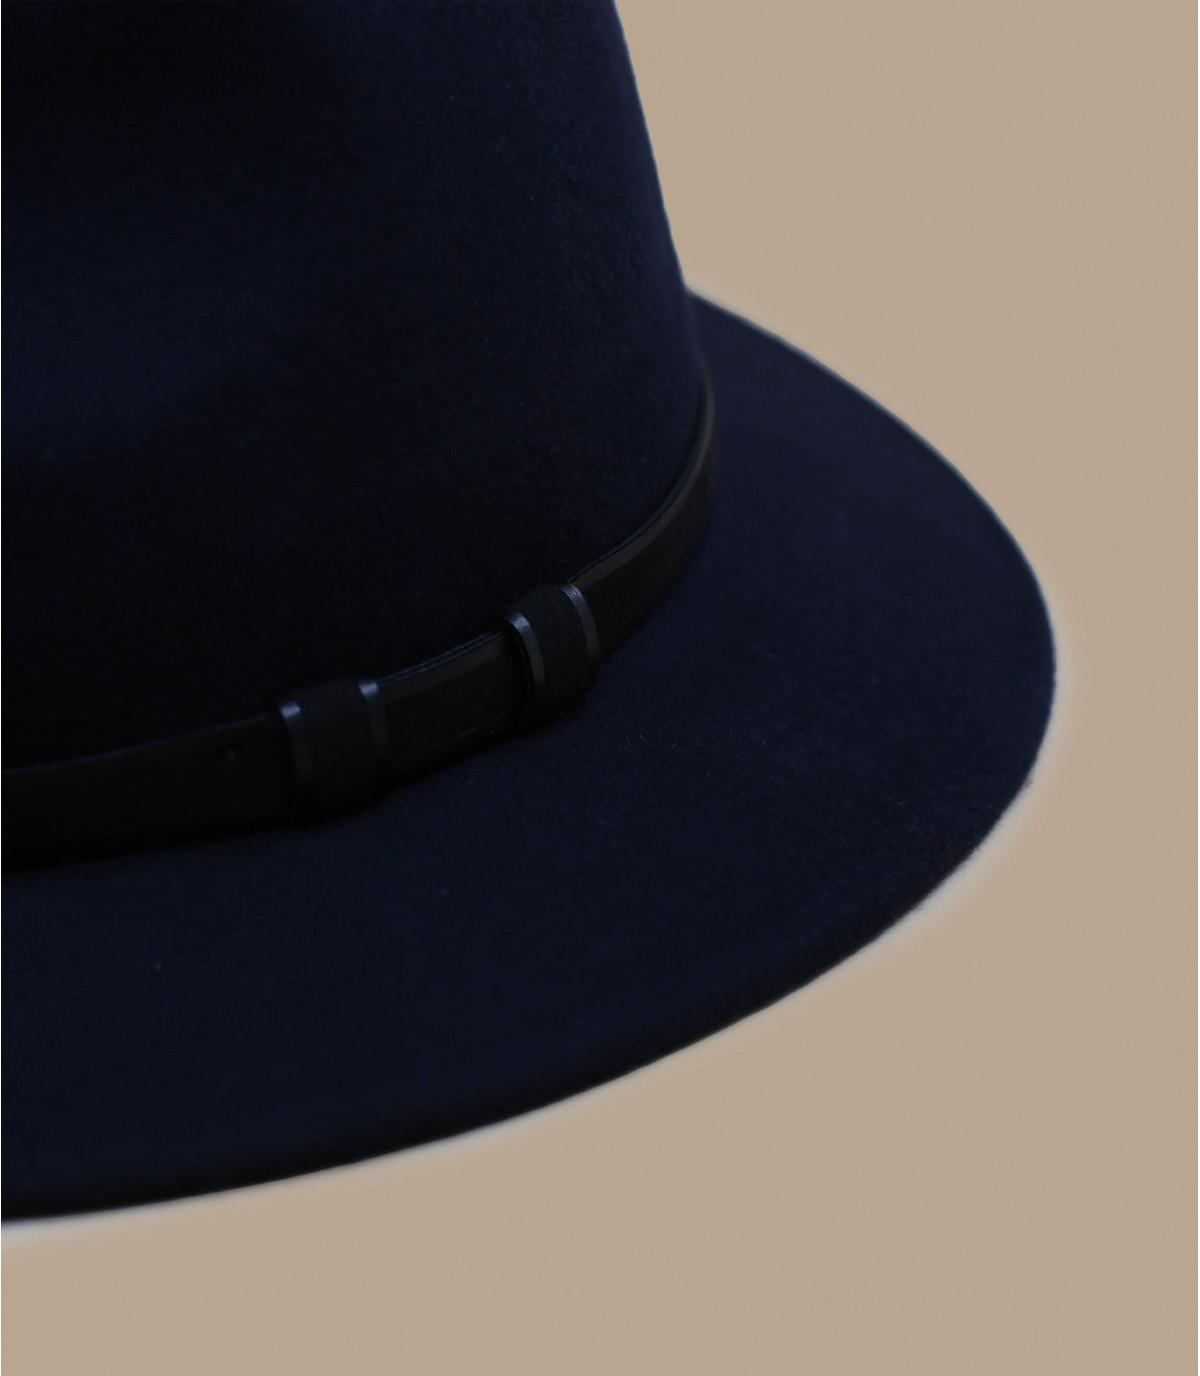 Details Harvey marineblau - Abbildung 2